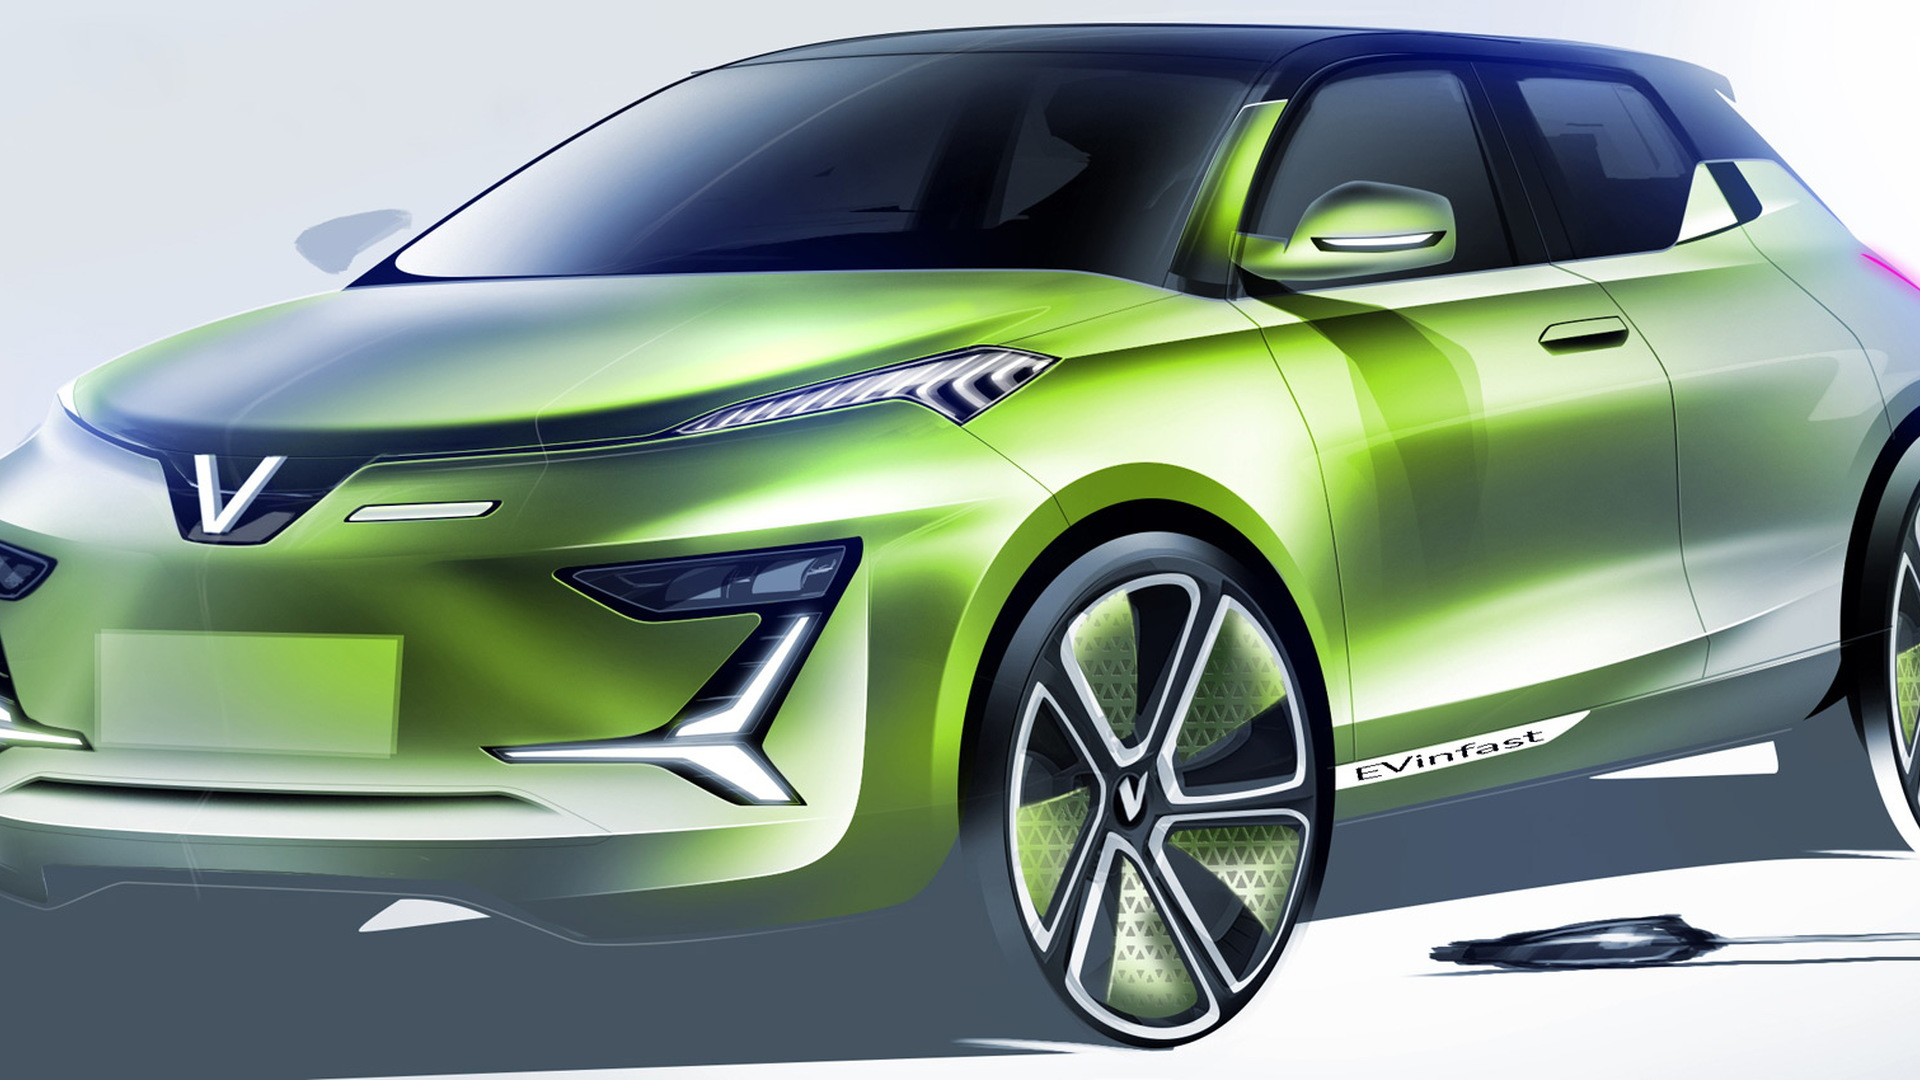 Italdesign proposal sketch for Vinfast electric crossover SUV